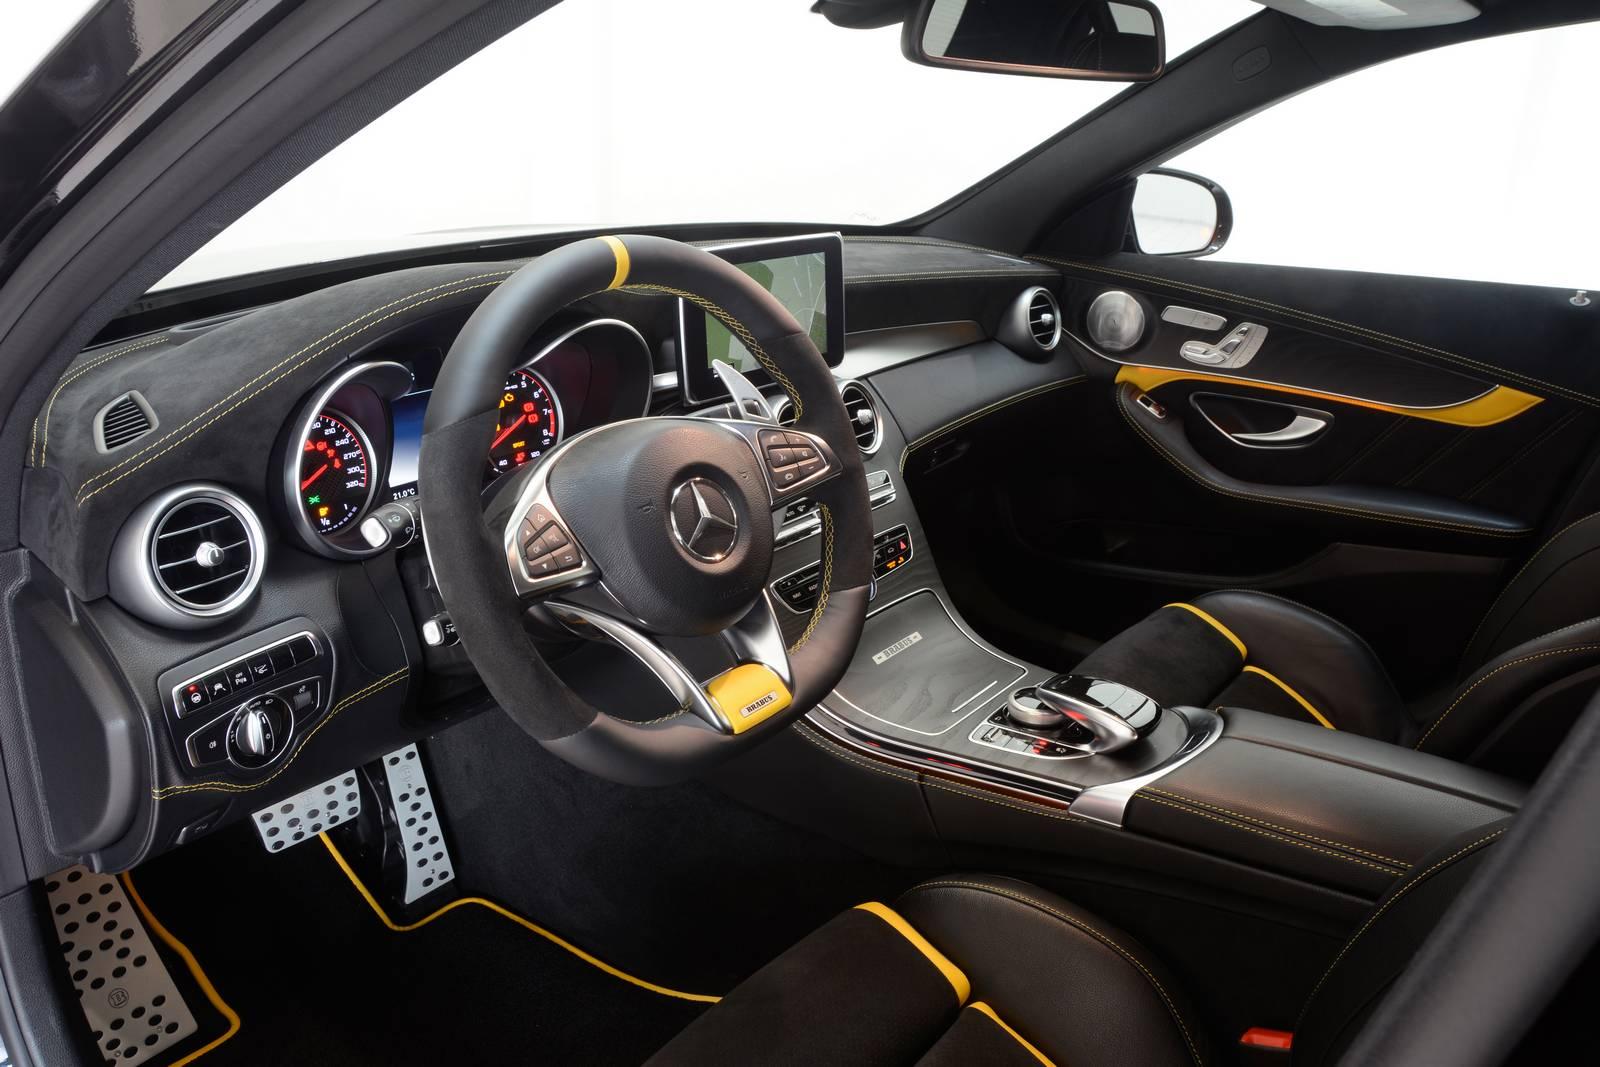 2015 Porsche 911 Gtr Carbon Topcar 1 also Gespot De 20 Geelste Autos Van Londen 76744 also respond additionally Ngam Dien Mao Cua Mercedes Amg C63 S Cabriolet Sau Khi Qua Tay Brabus moreover Doczilla12s Liberty Walk Nissan Gtr. on mercedes amg c63 s coupe dmc